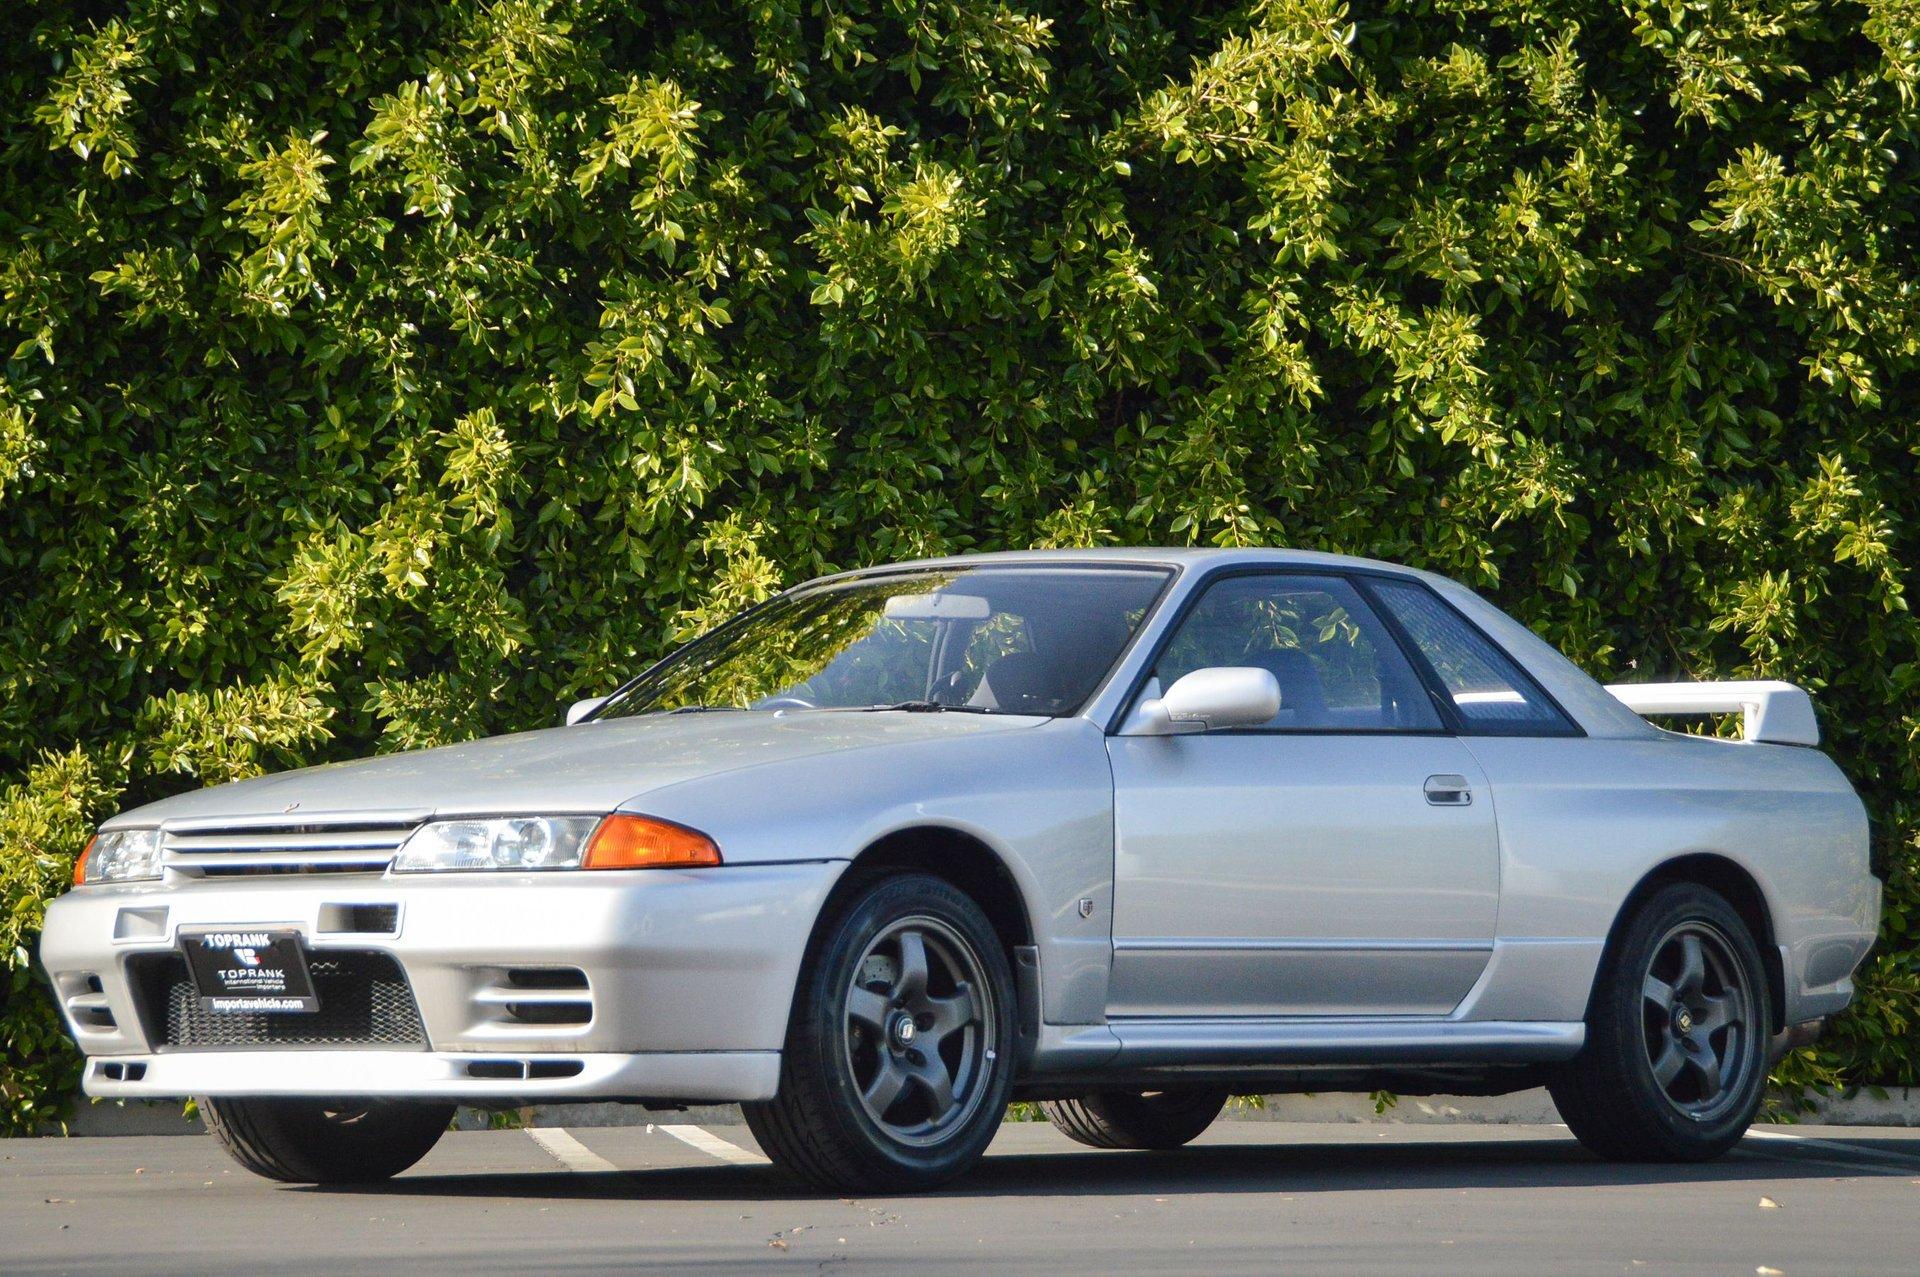 1993 Nissan Skyline GT-R